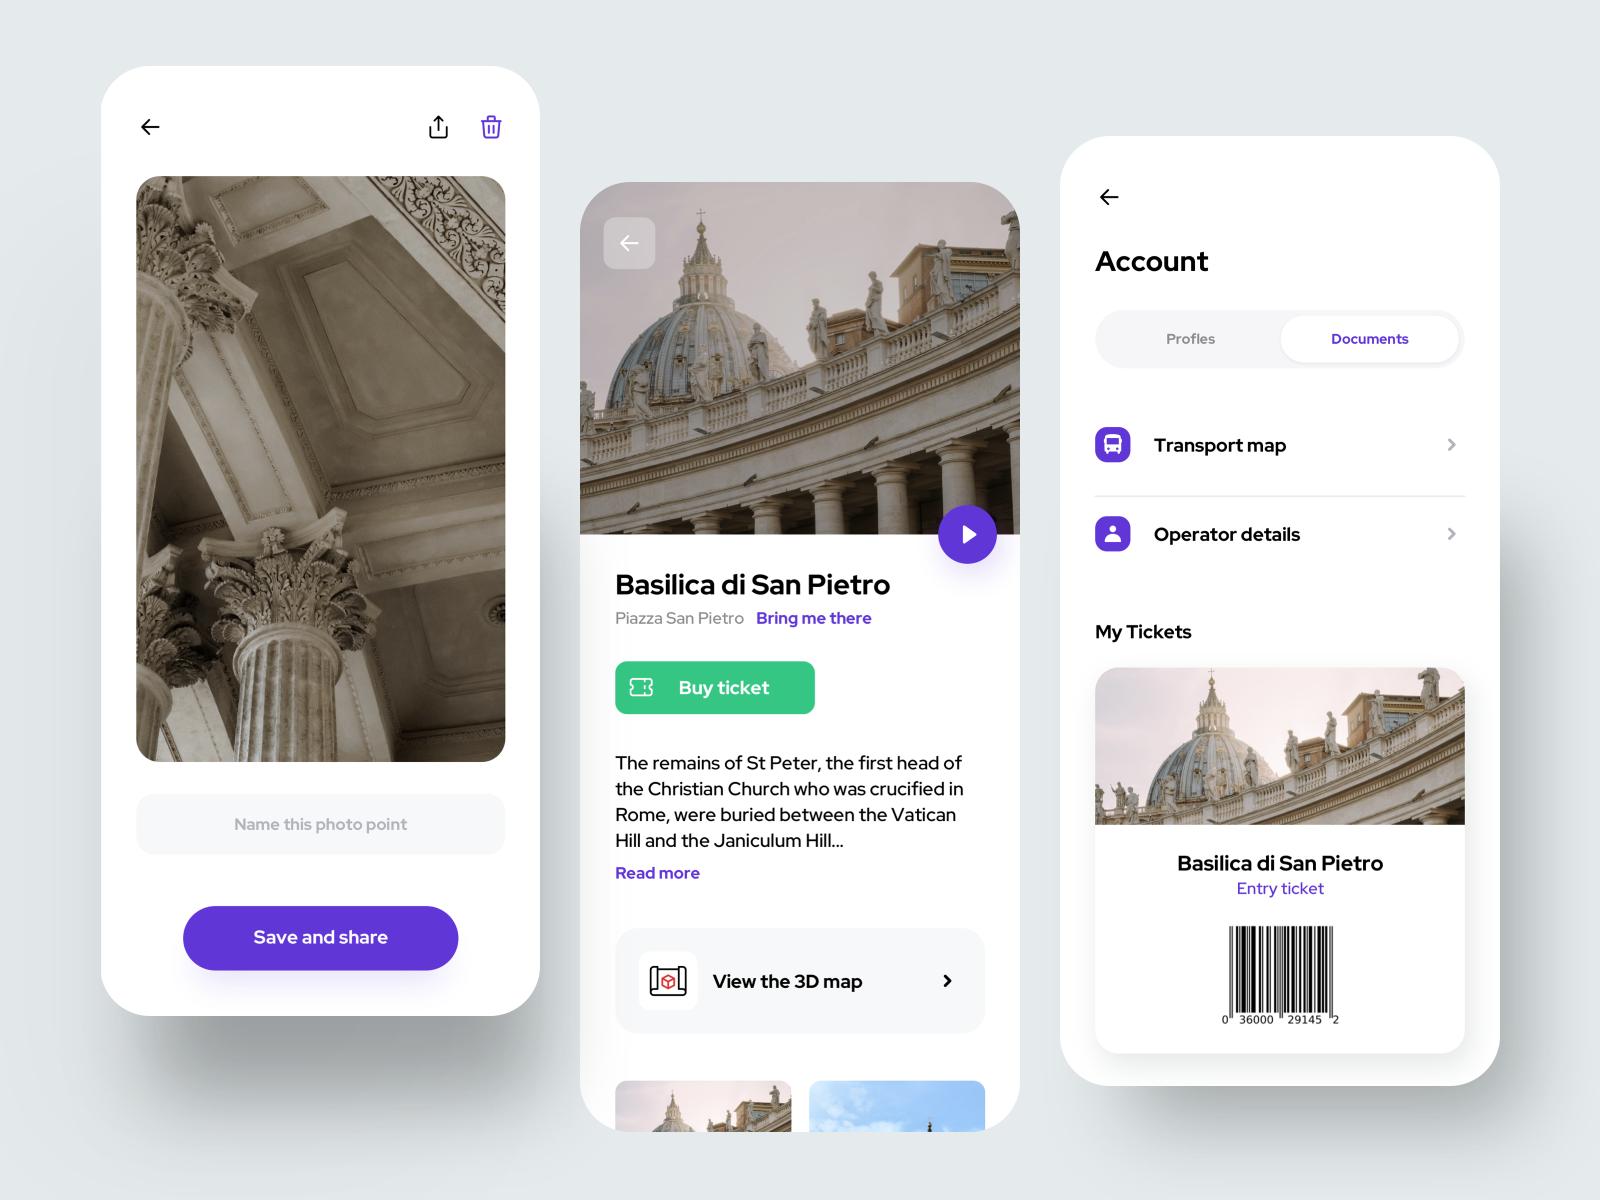 Travel App (Details)